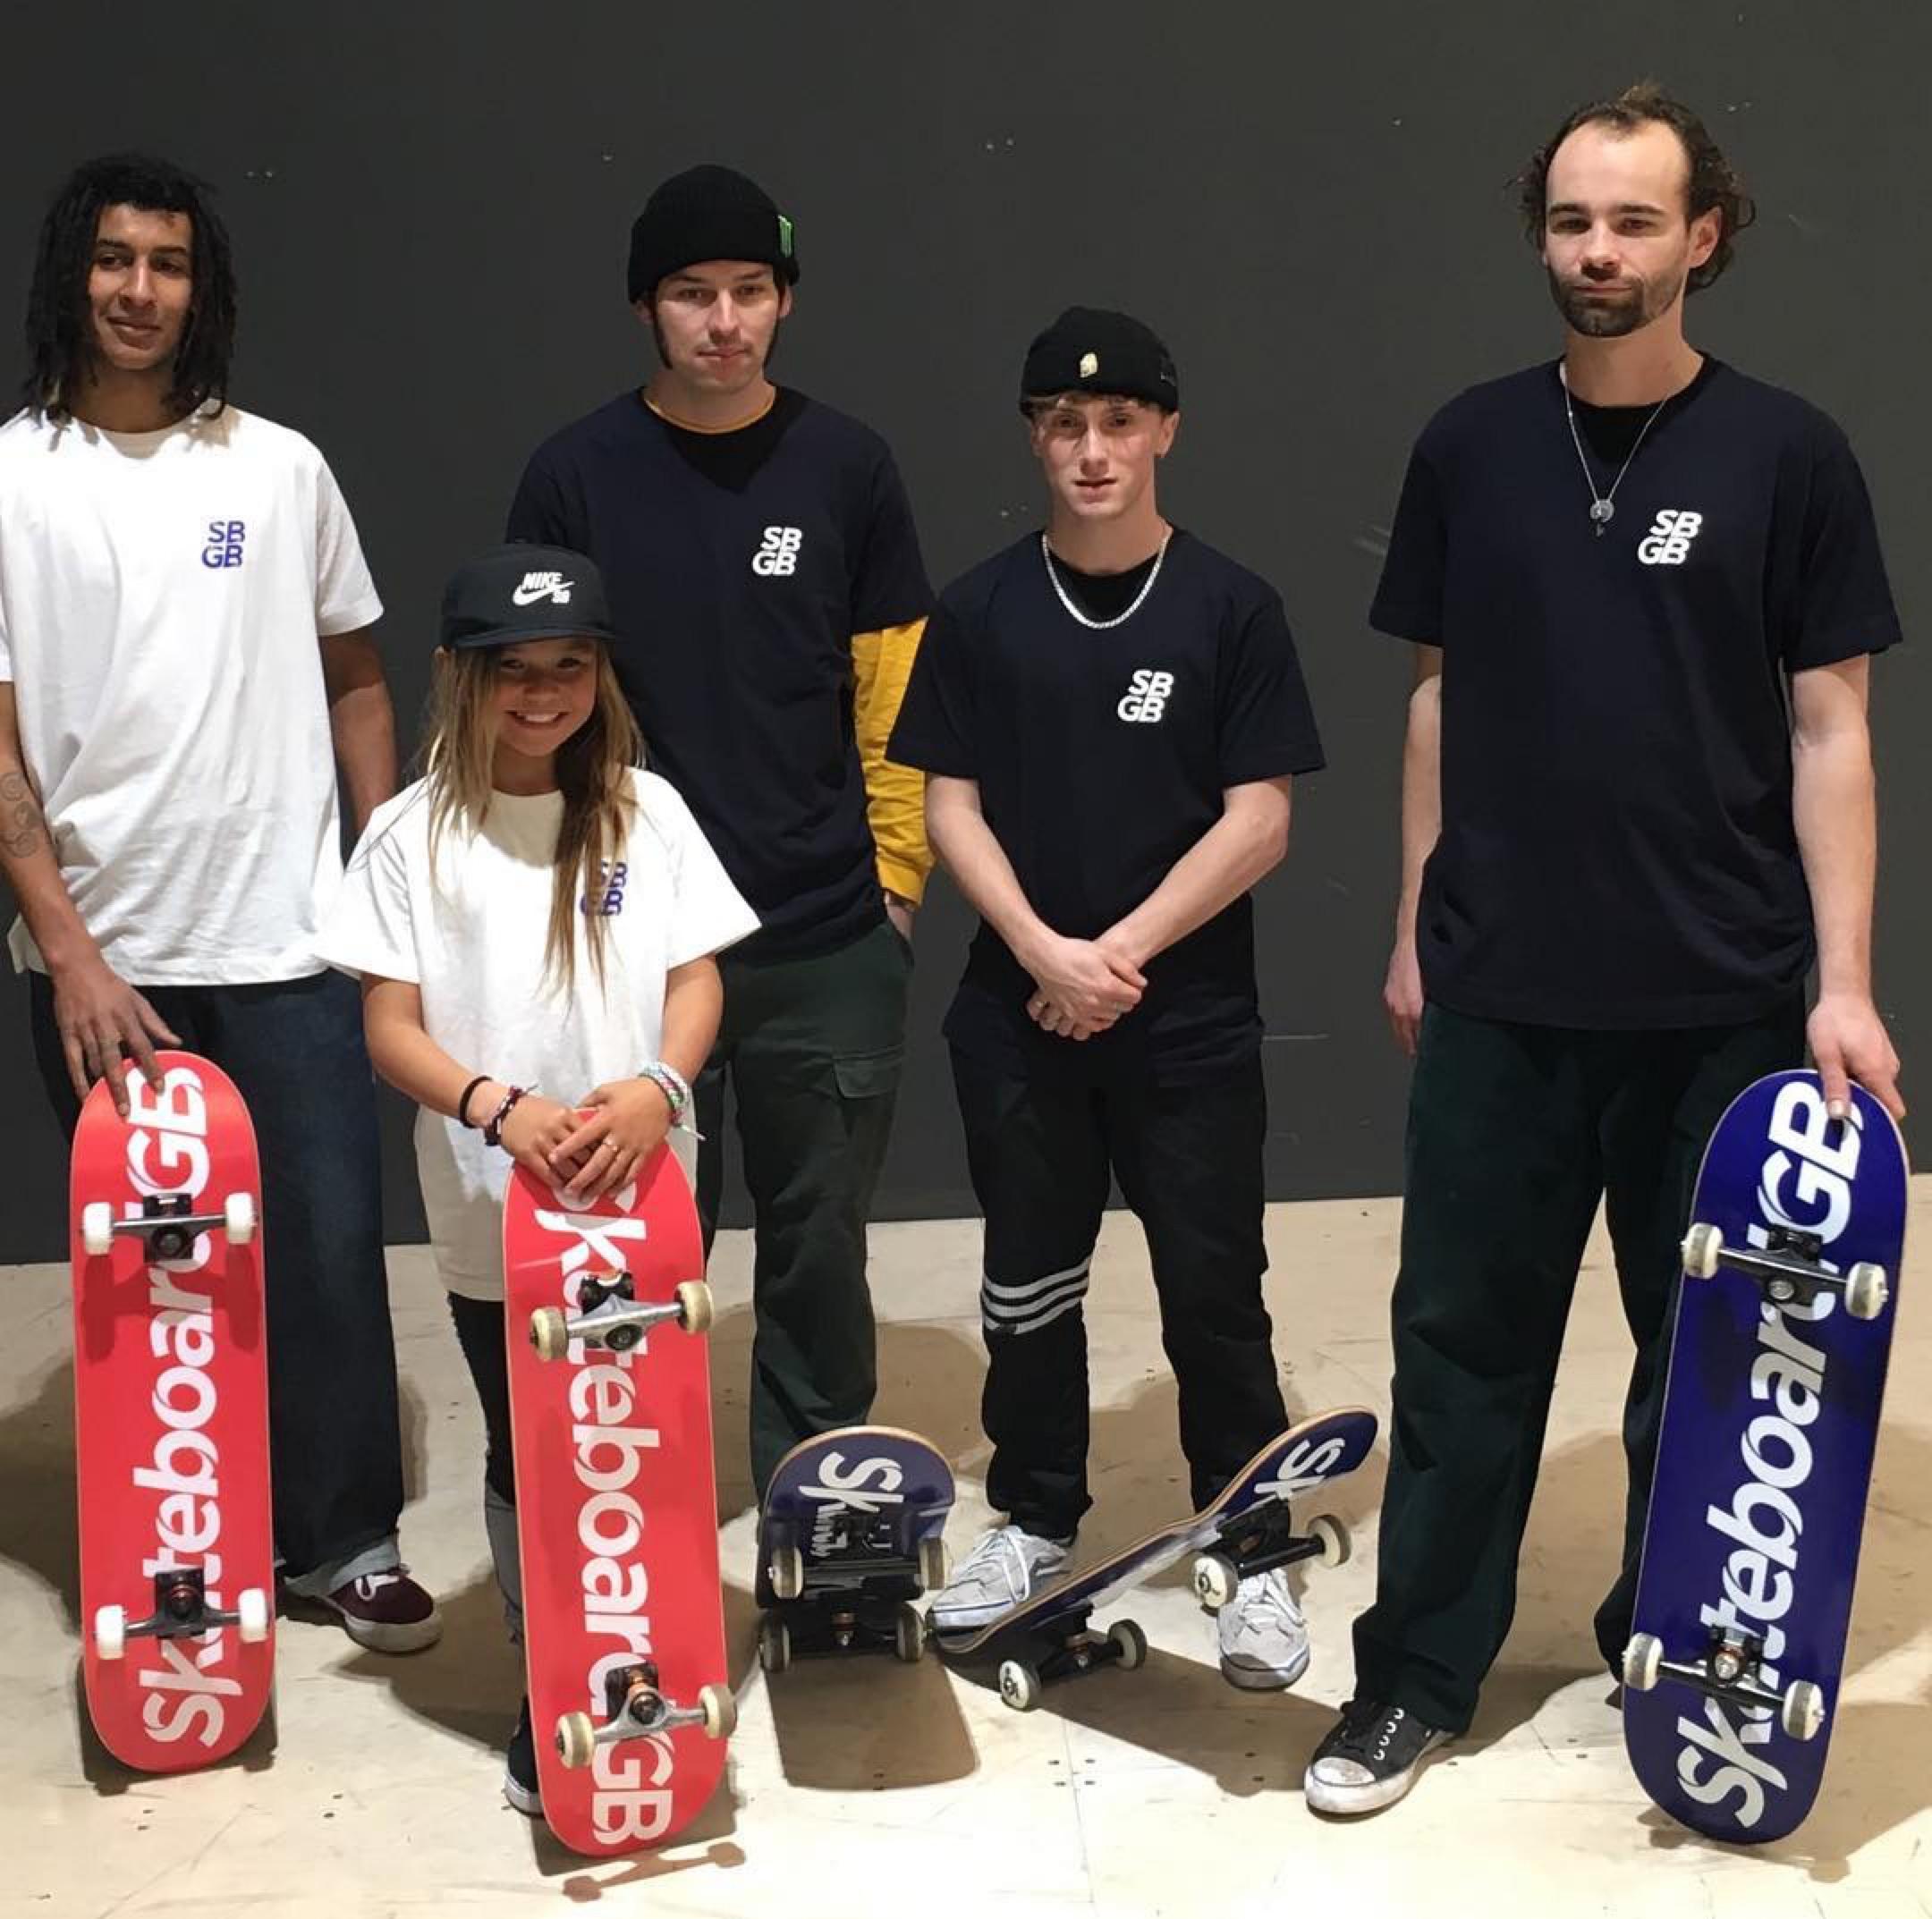 British Skateboard Olympic Team